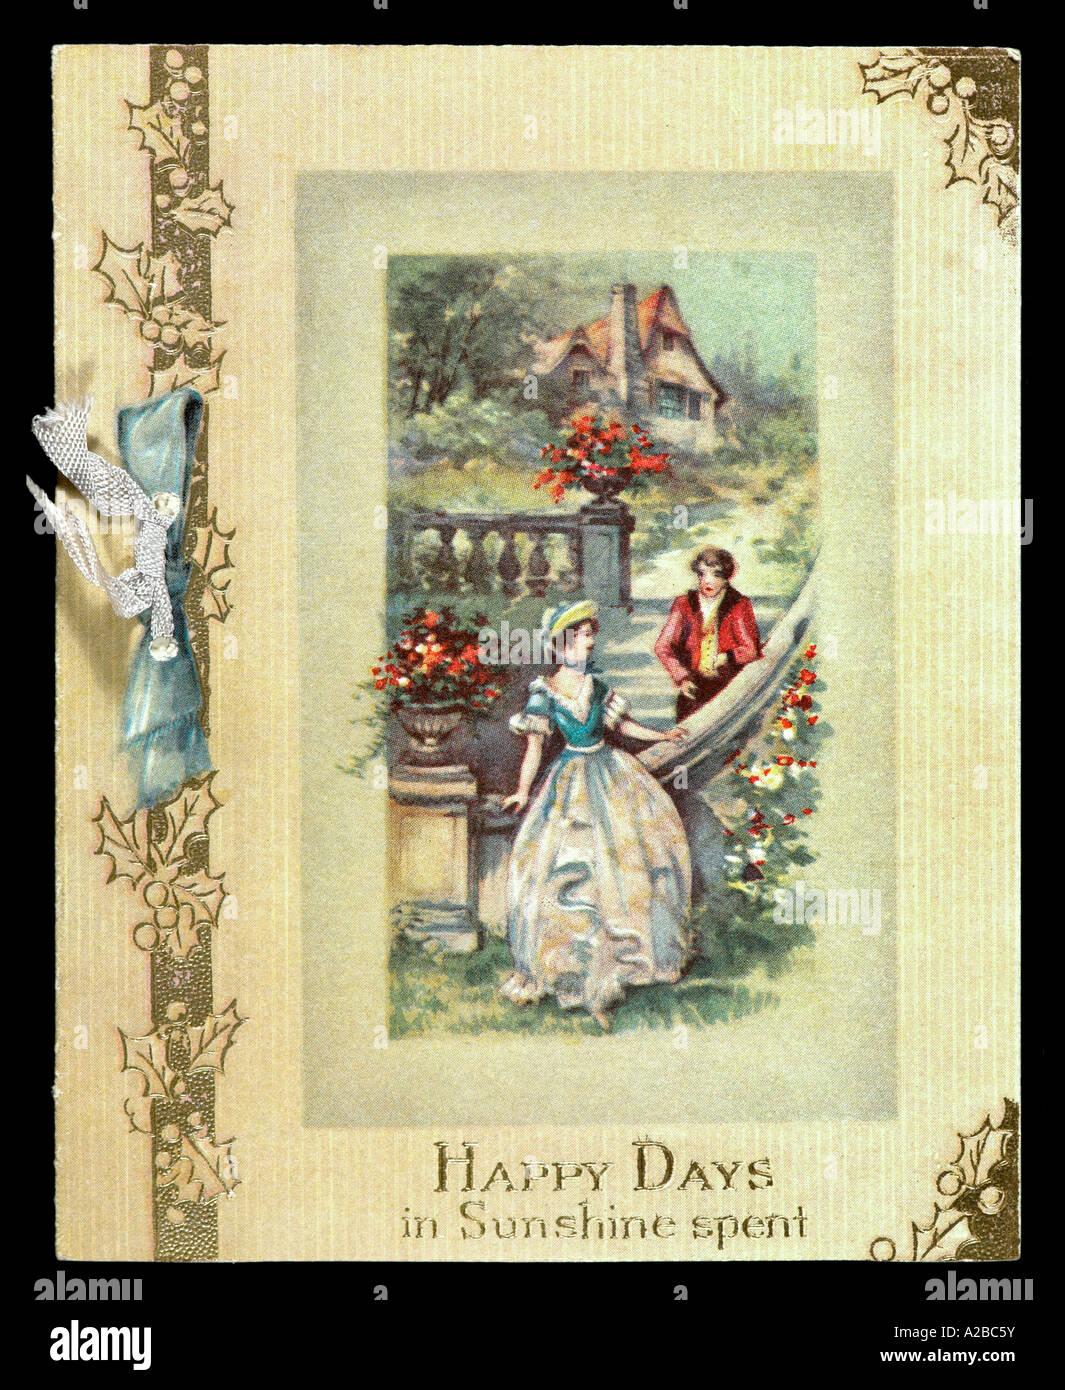 Vintage Early 20th Century Christmas Card Stock Photo: 10468934 - Alamy